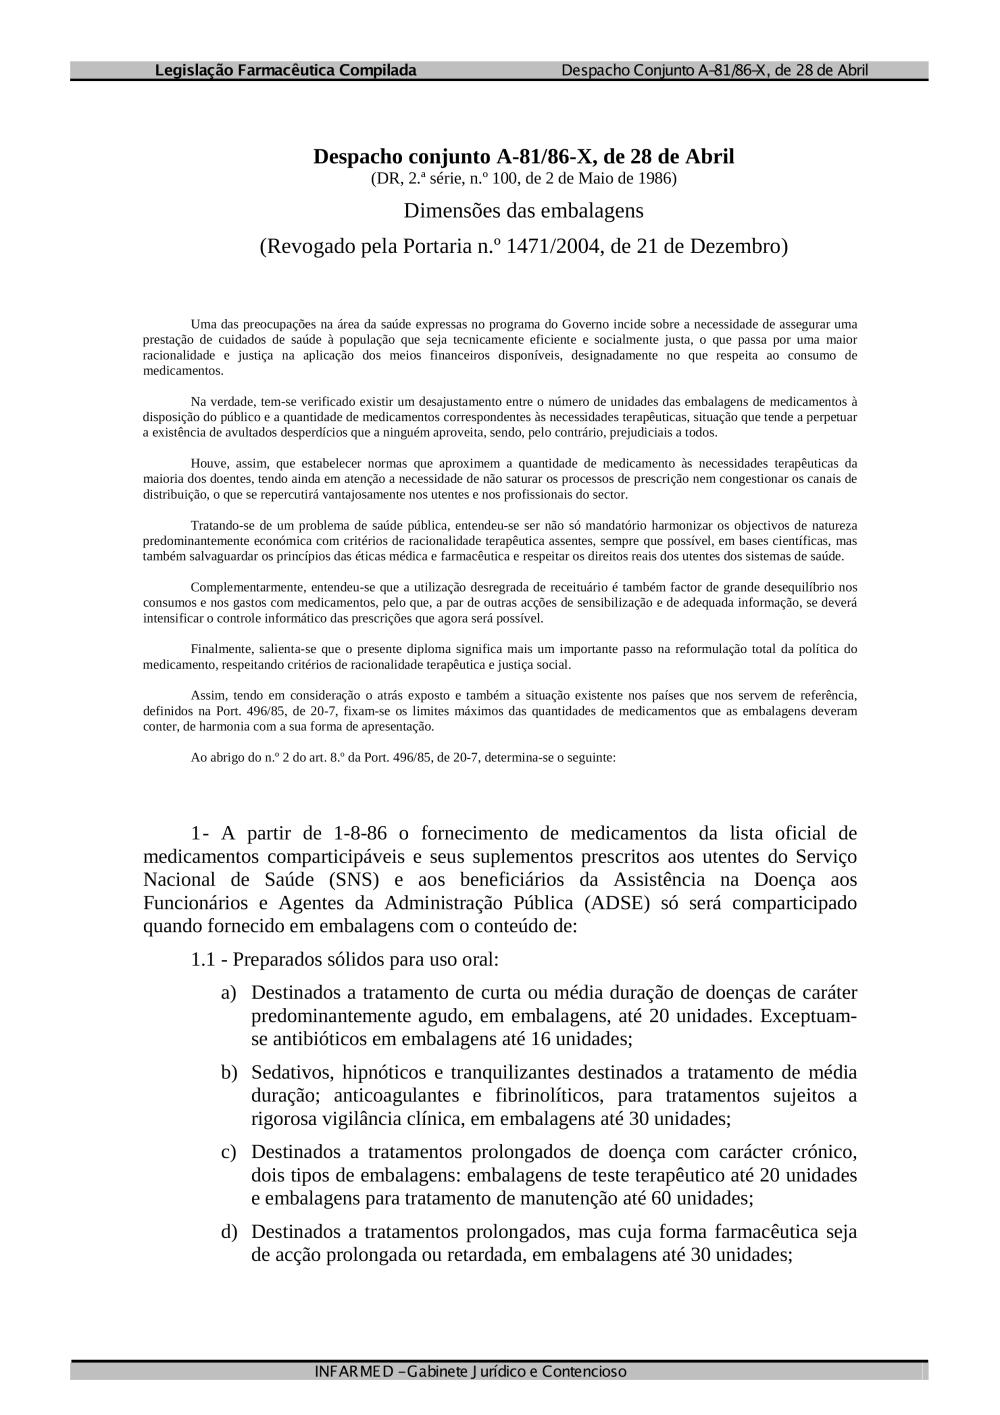 7f6c8394d despacho conj A-81 86-X.pdf - Alertas de segurança - INFARMED